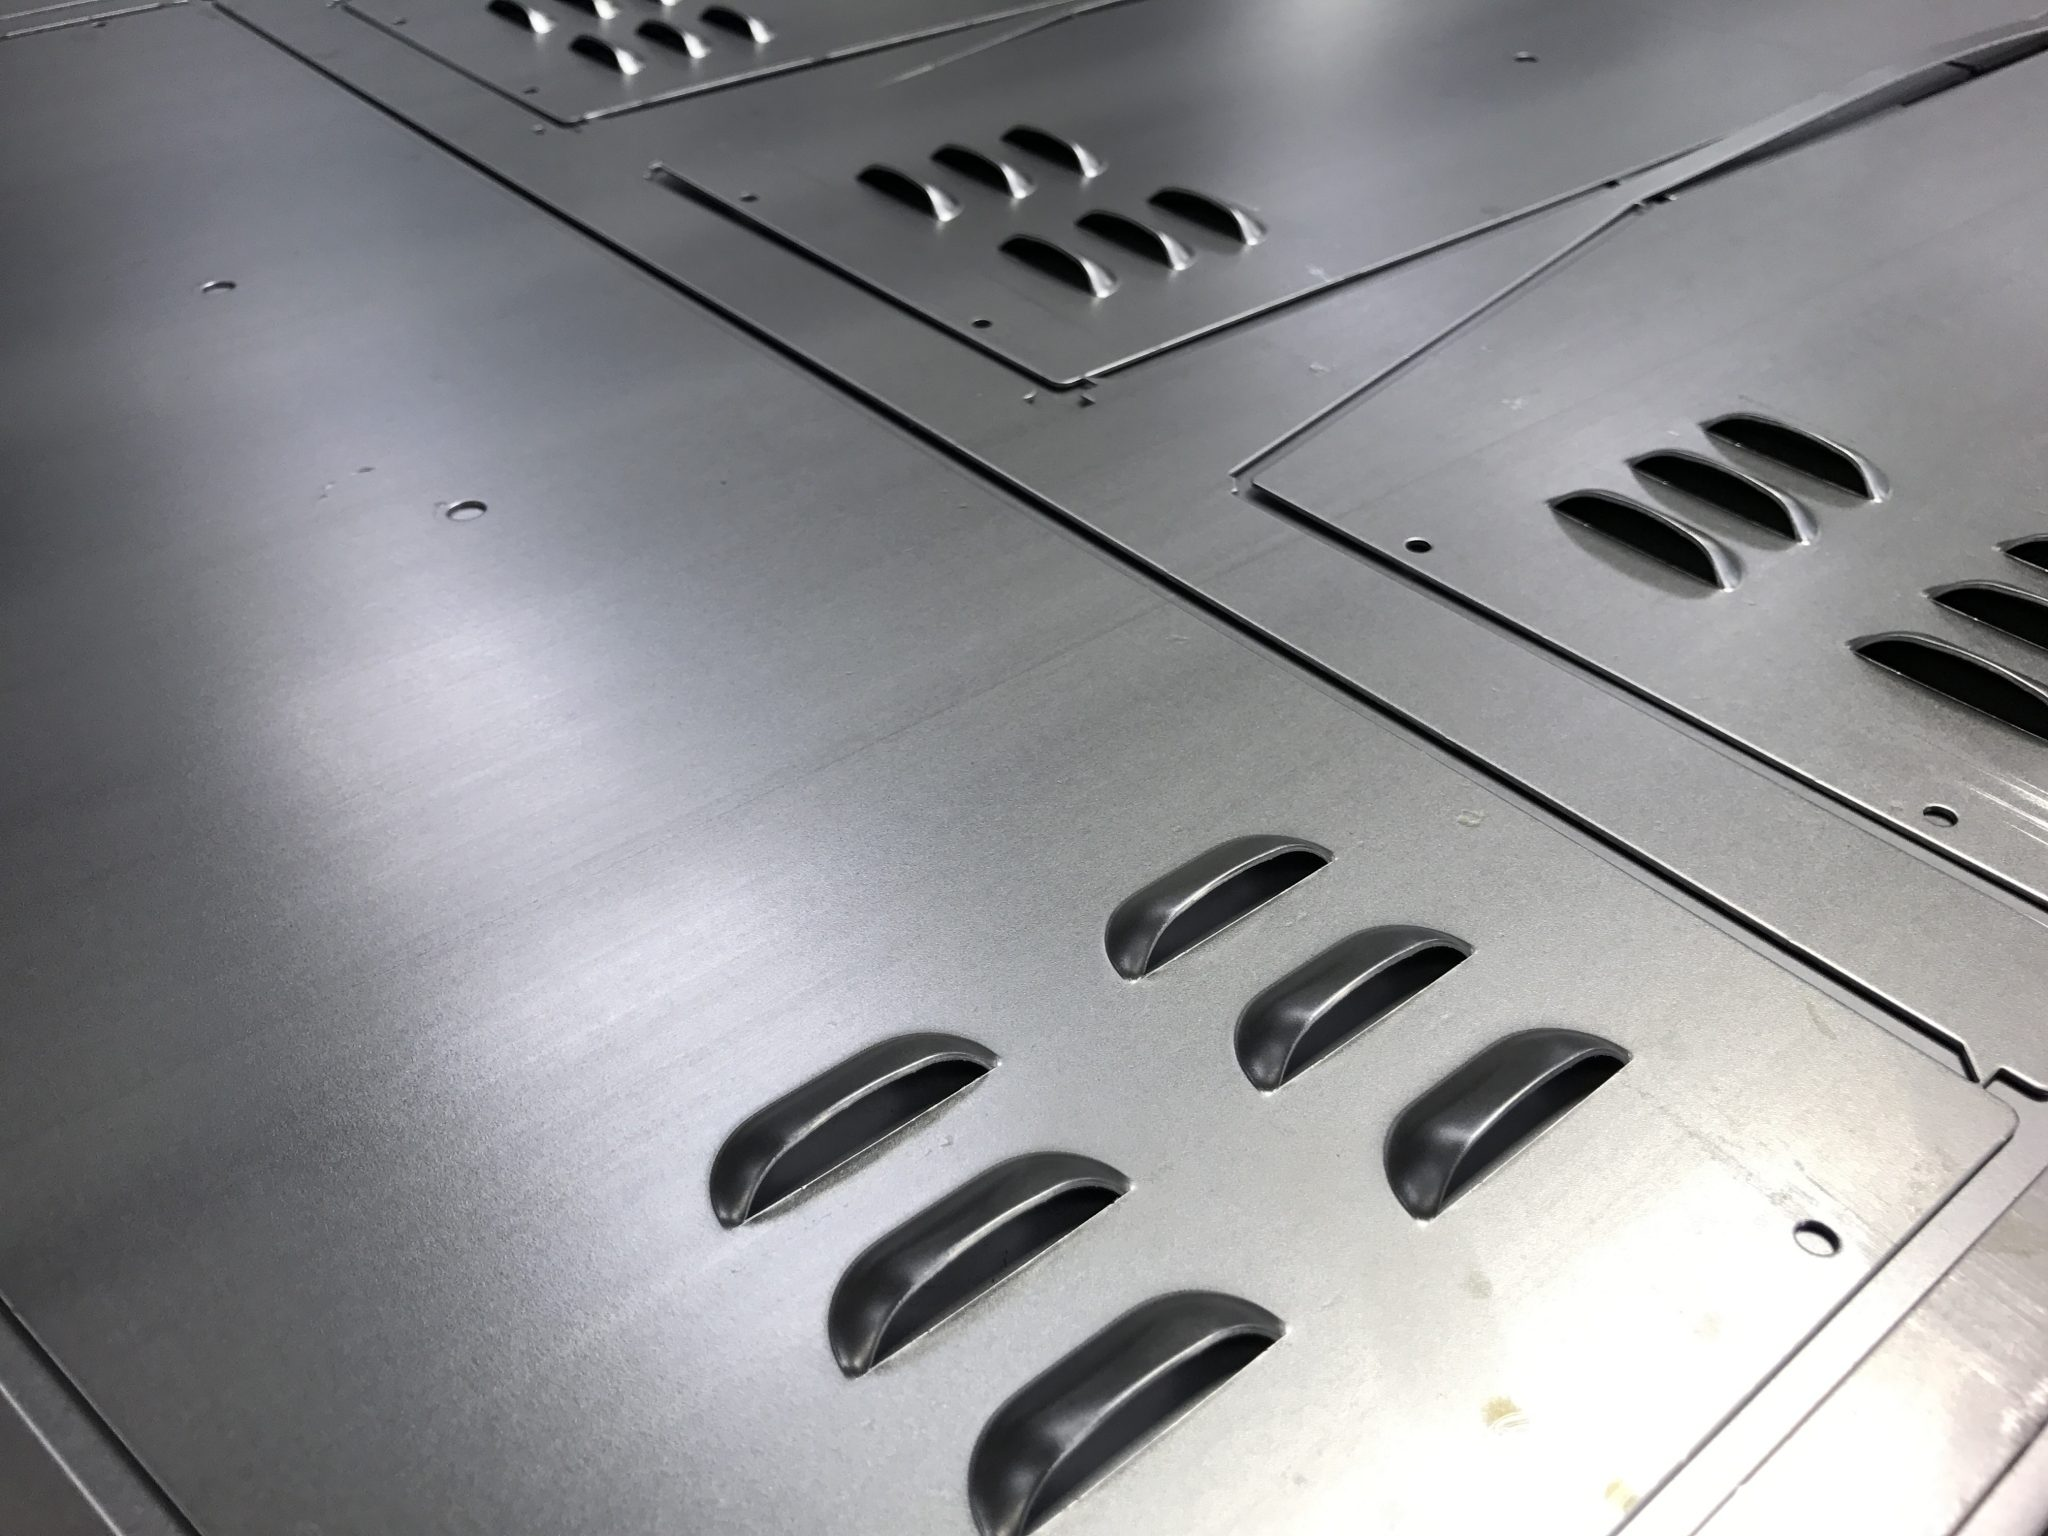 Cnc Punching Sheet Metal Work Supplier Based In The Uk